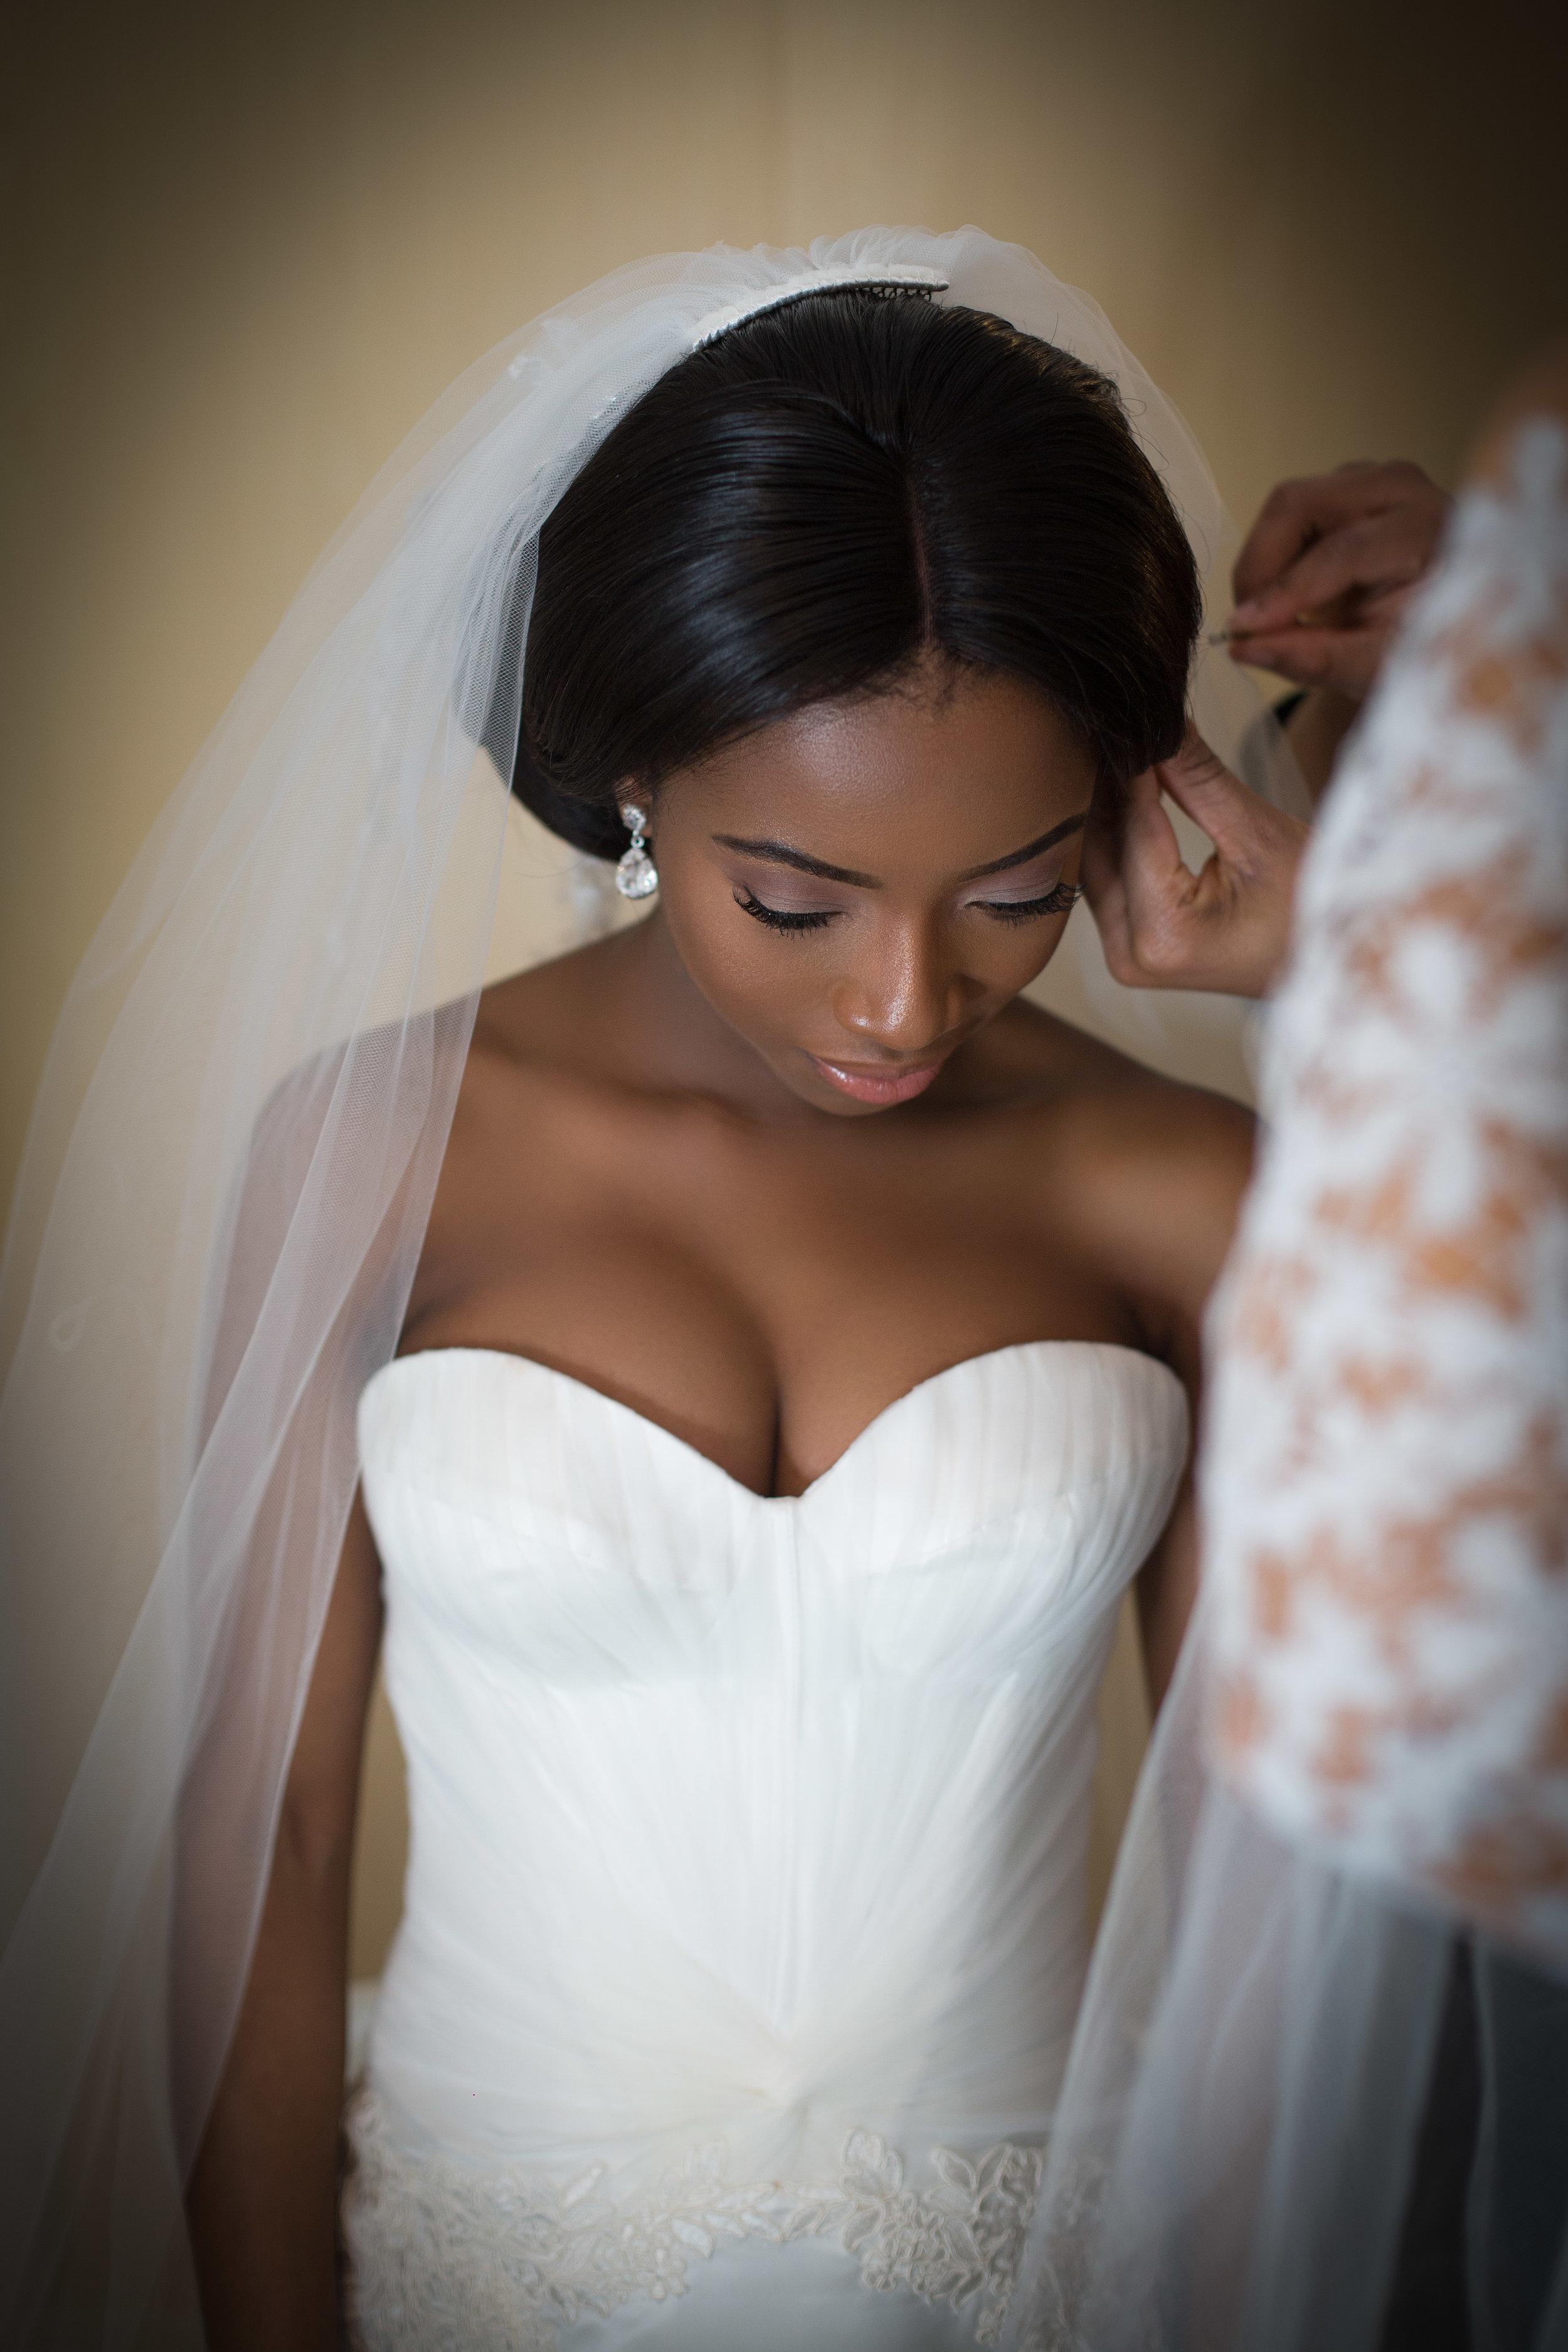 Nyam-Ola-London-wedding-photography-5.jpg